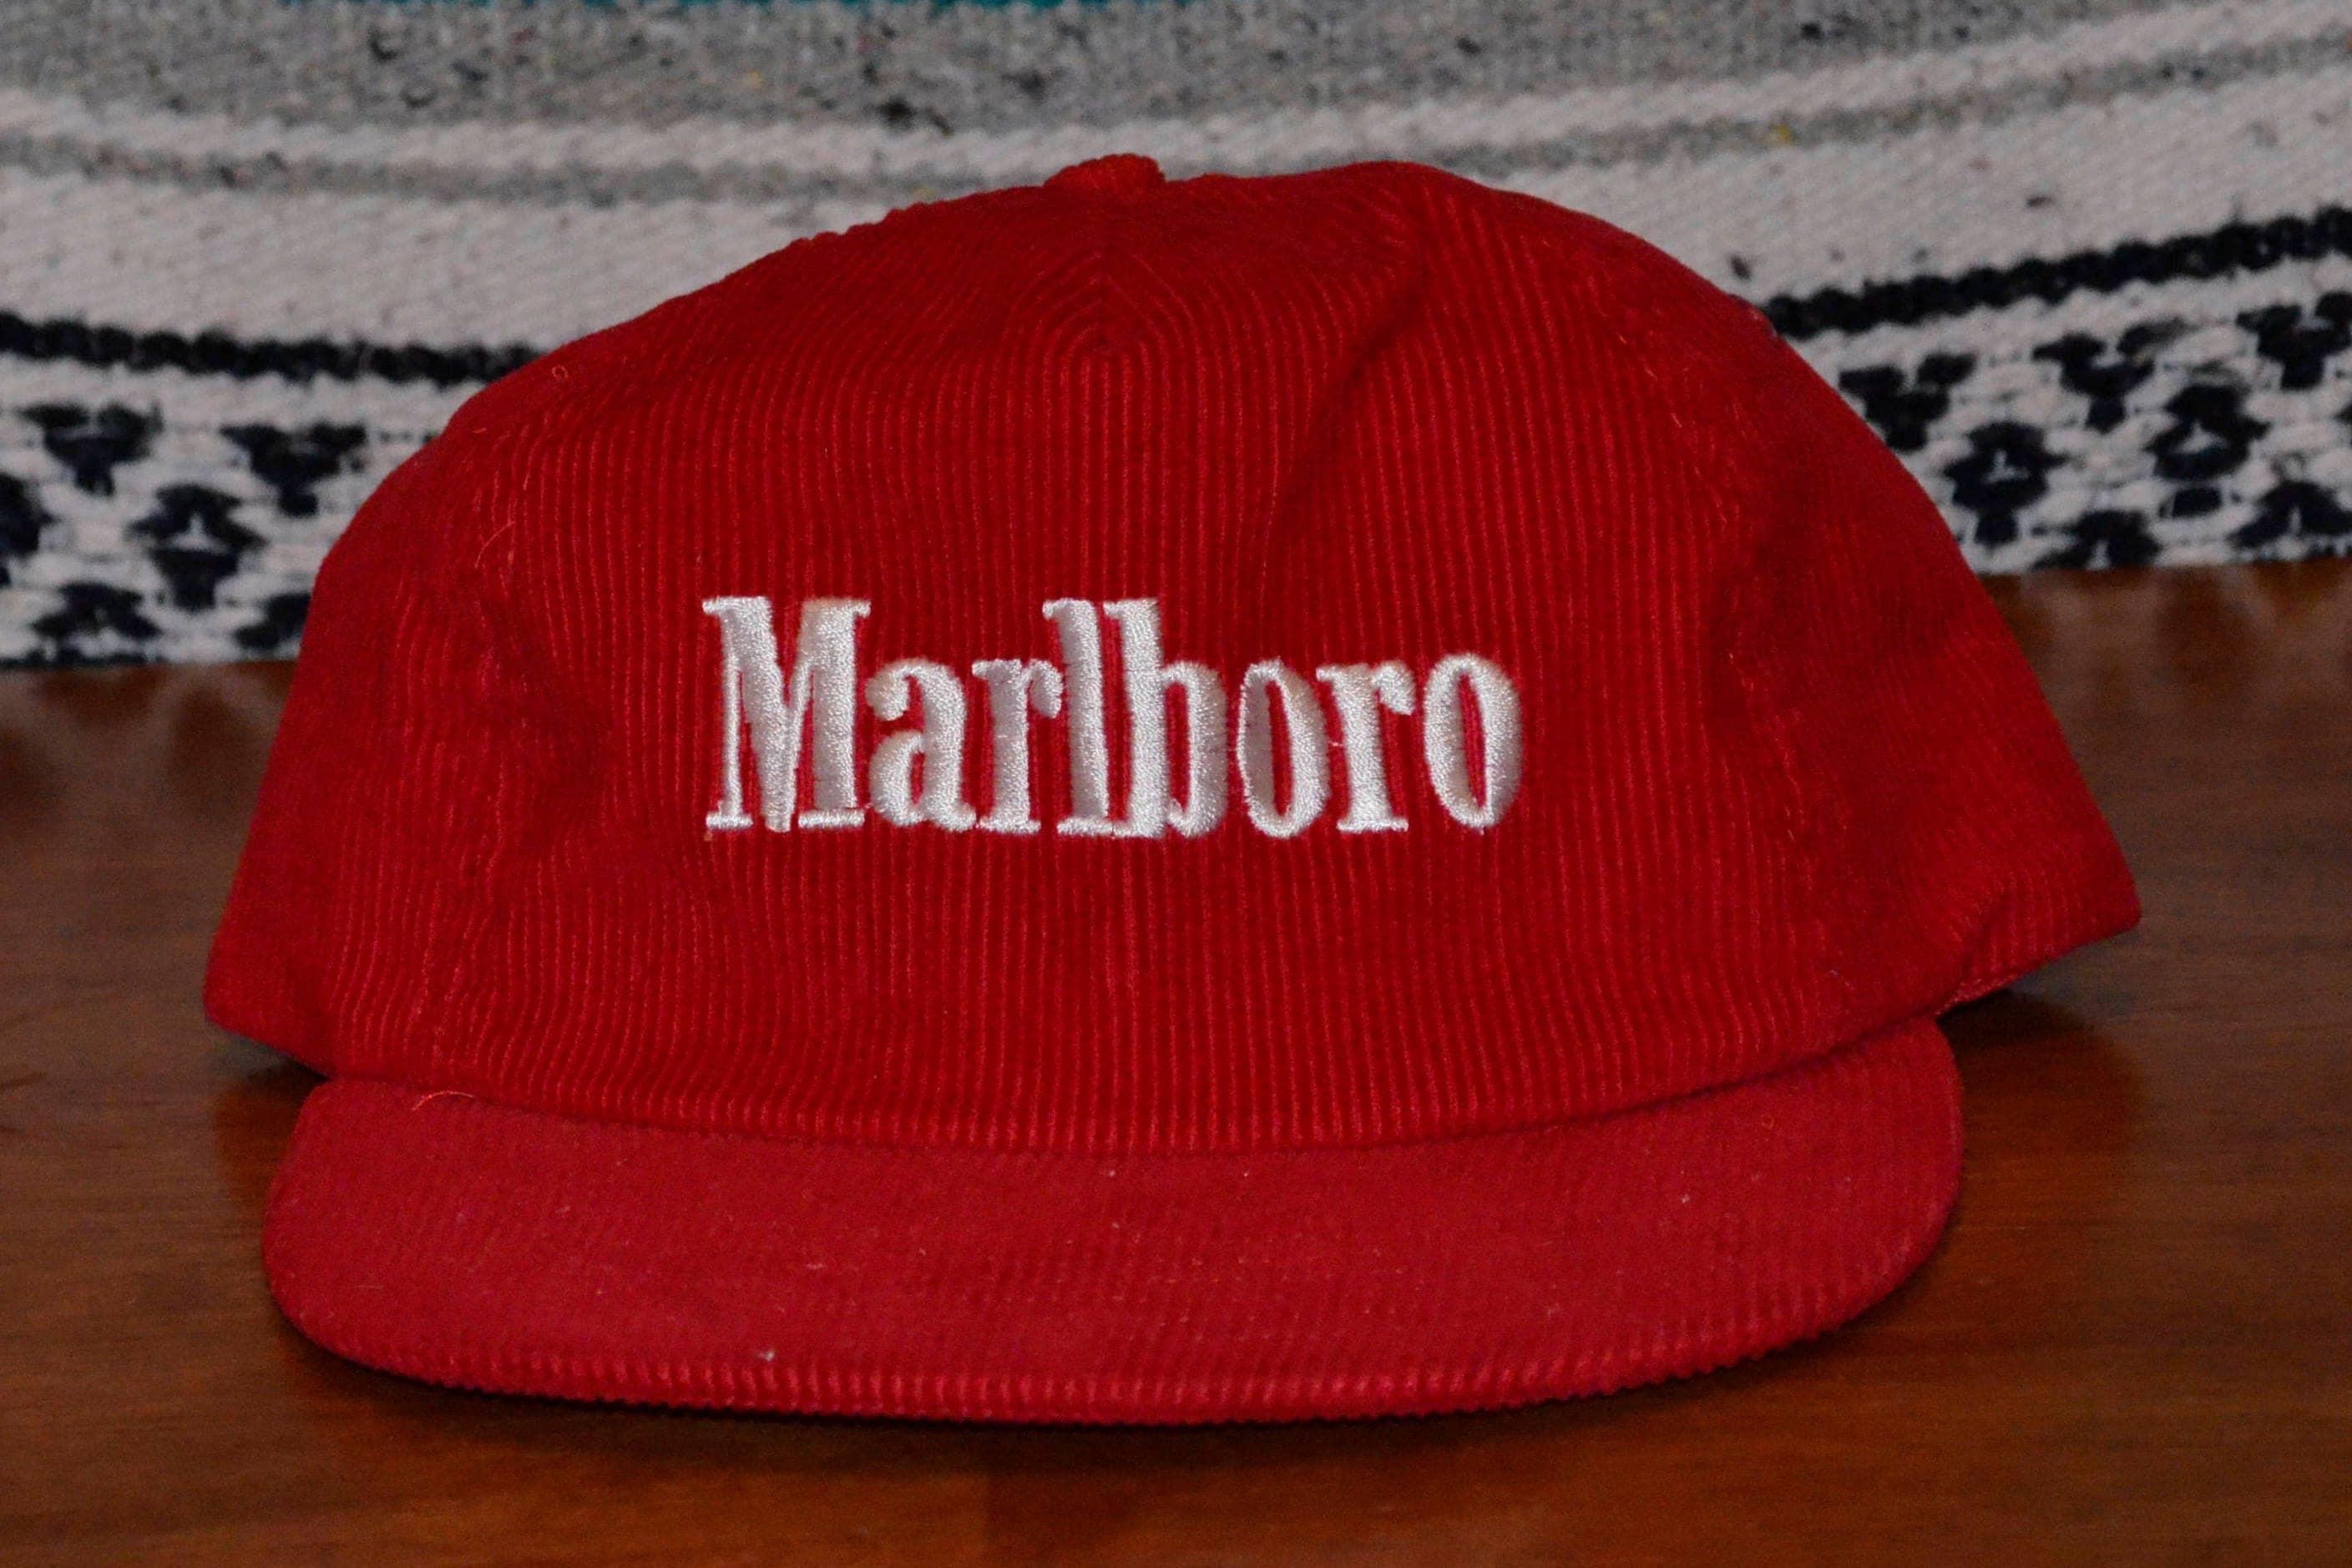 Marlboro Corduroy Red Hat Cap Adjustable Snapback  E102114044563640M ... 1b0992b45f4